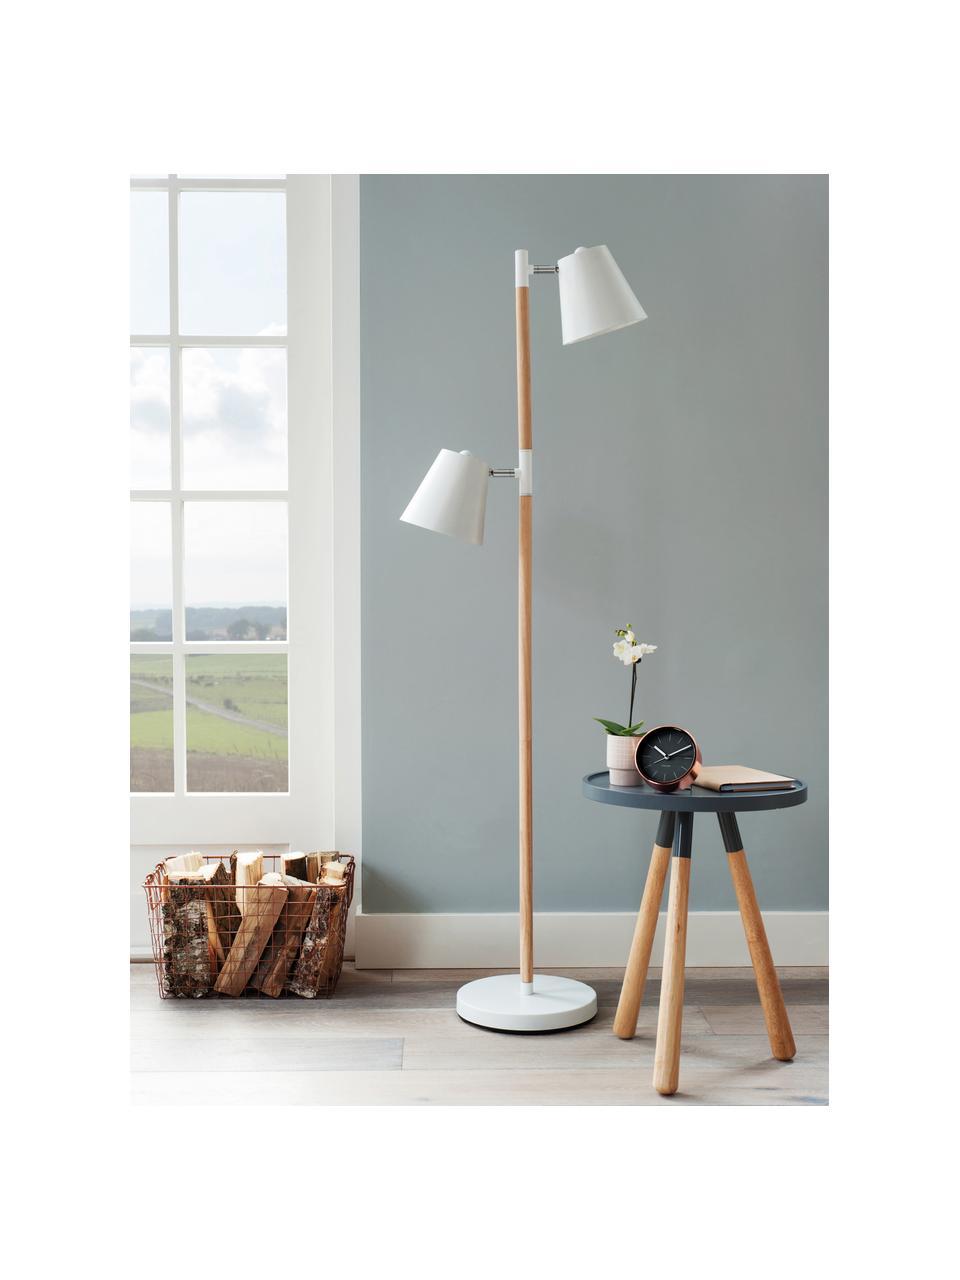 Skandi-Leselampe Rubi, Lampenschirm: Metall, beschichtet, Gestell: Holz, Lampenfuß: Metall, beschichtet, Weiß, Ø 18 x H 150 cm